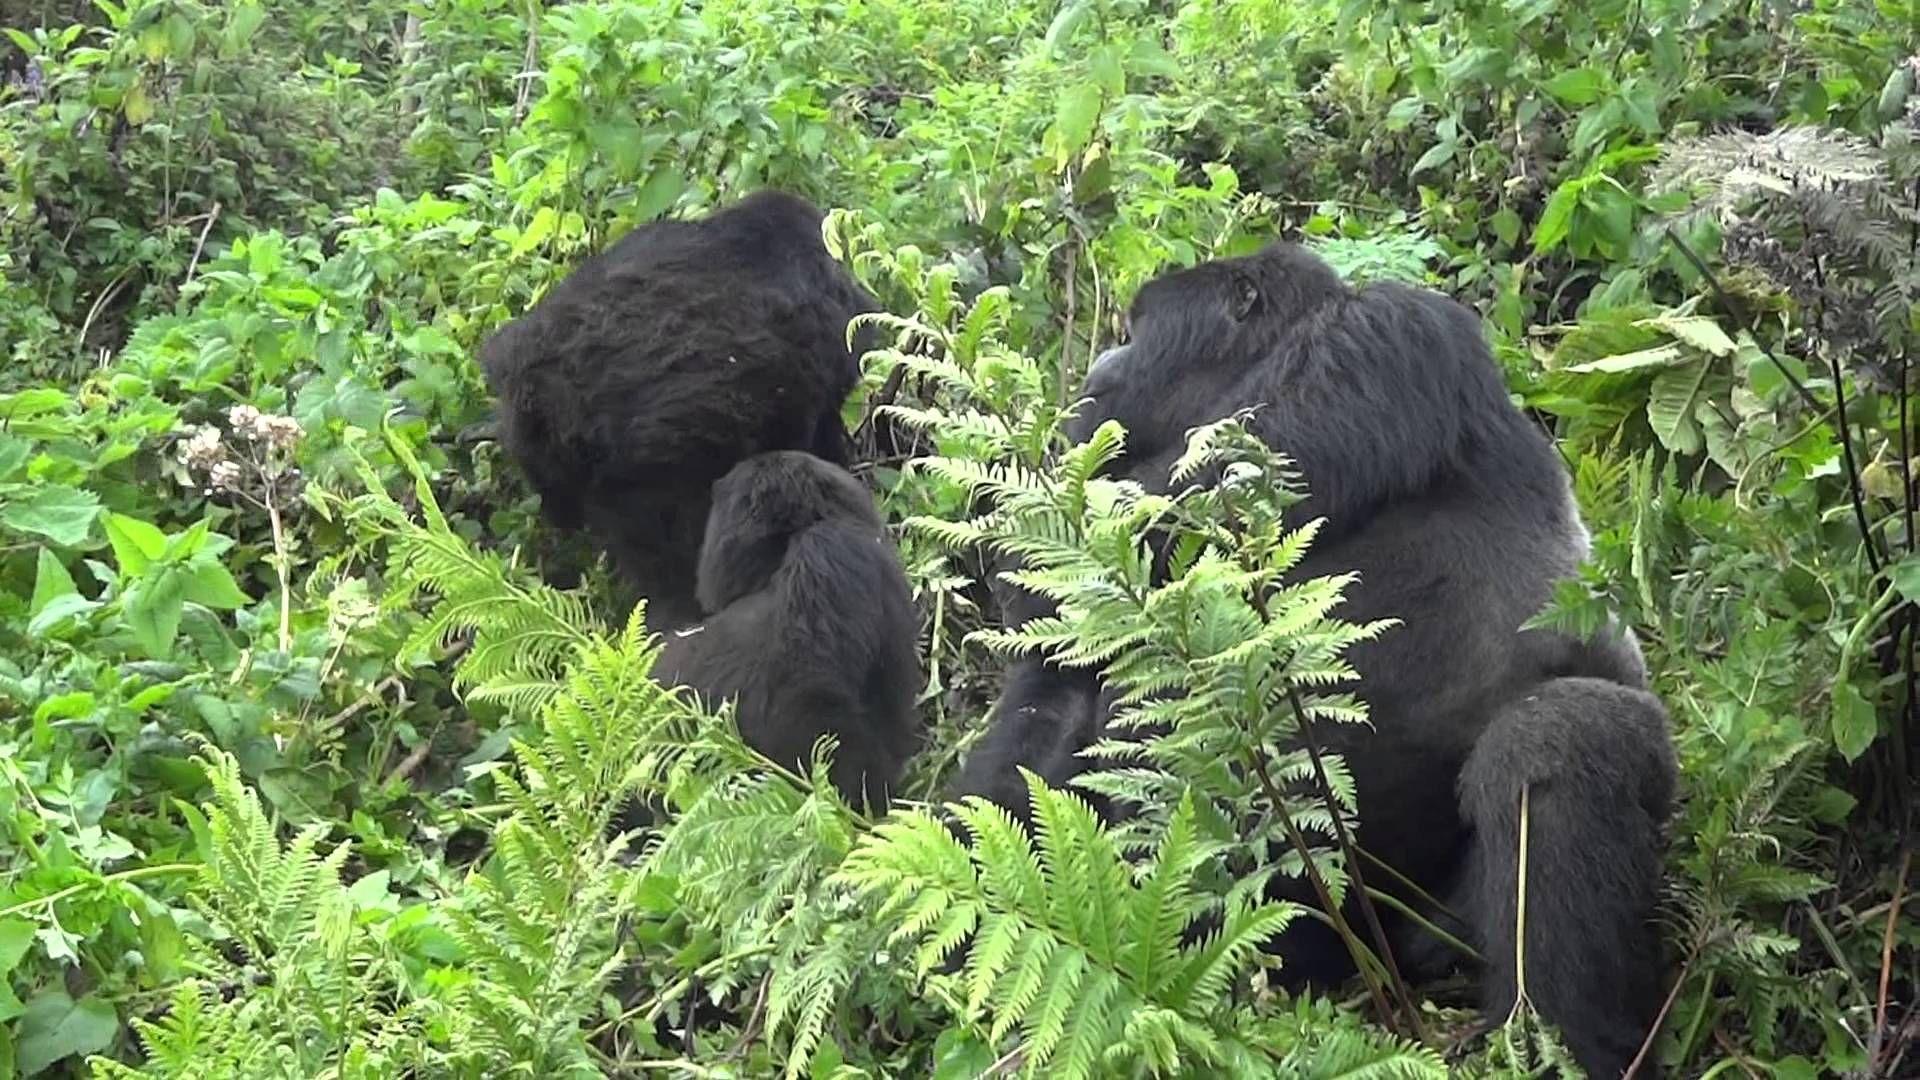 Tracking Gorillas In Parc Nationale Des Volcanoes In Rwanda Has